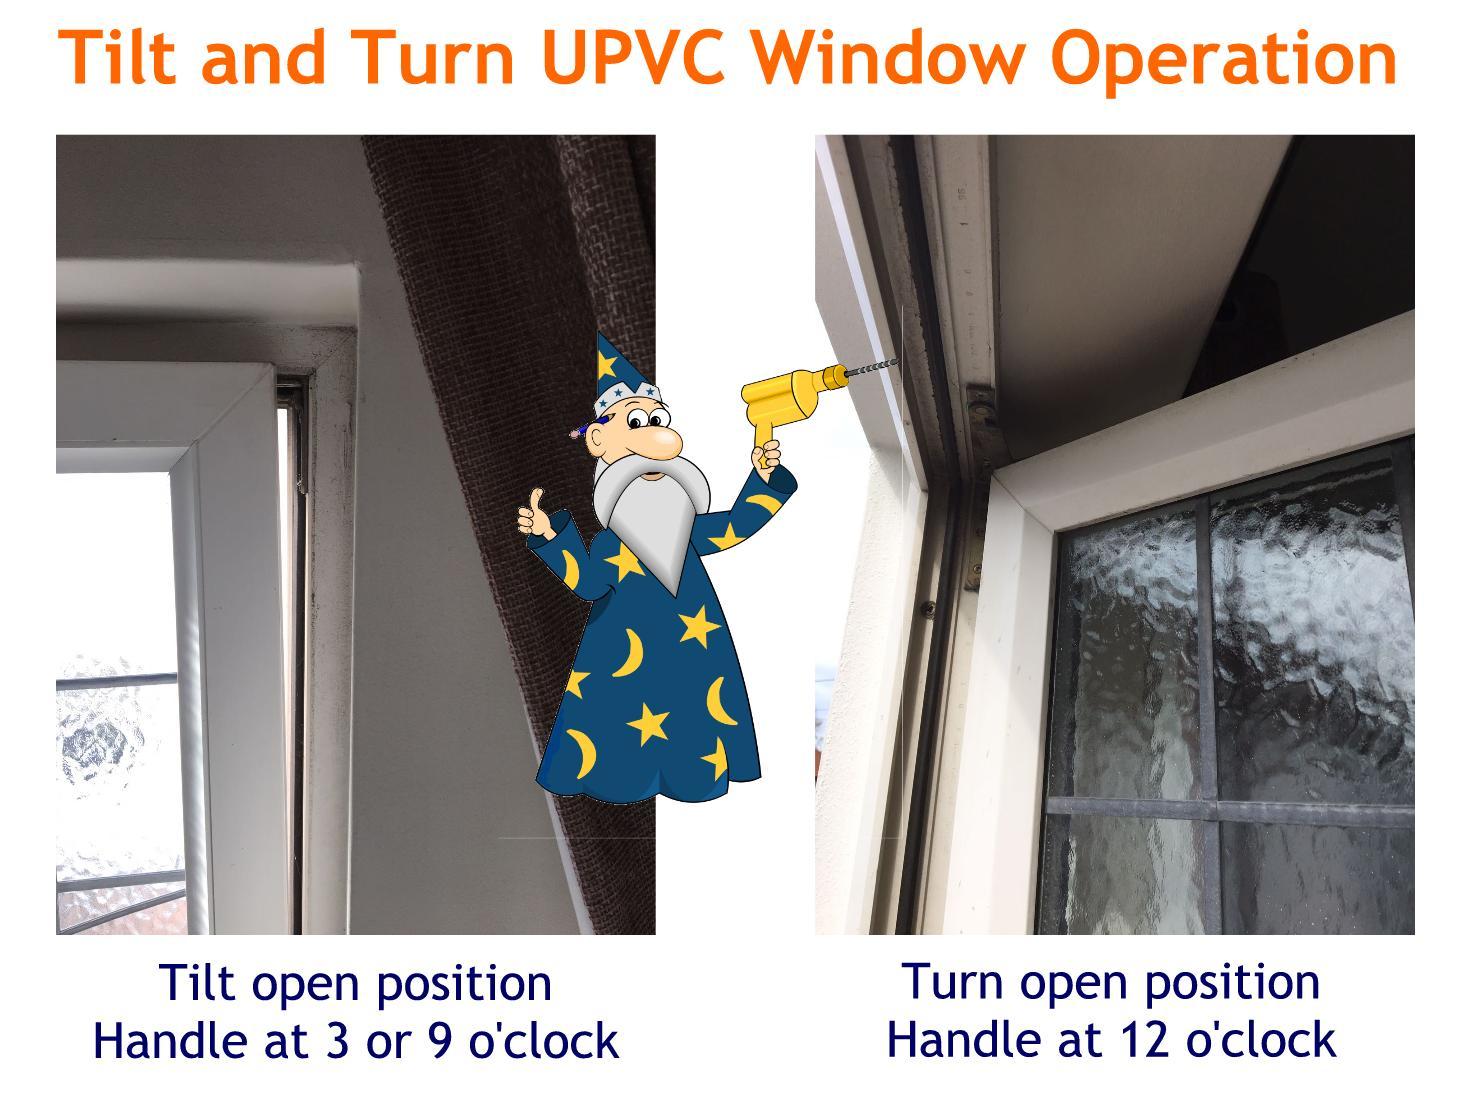 Upvc tilt and turn window repair service